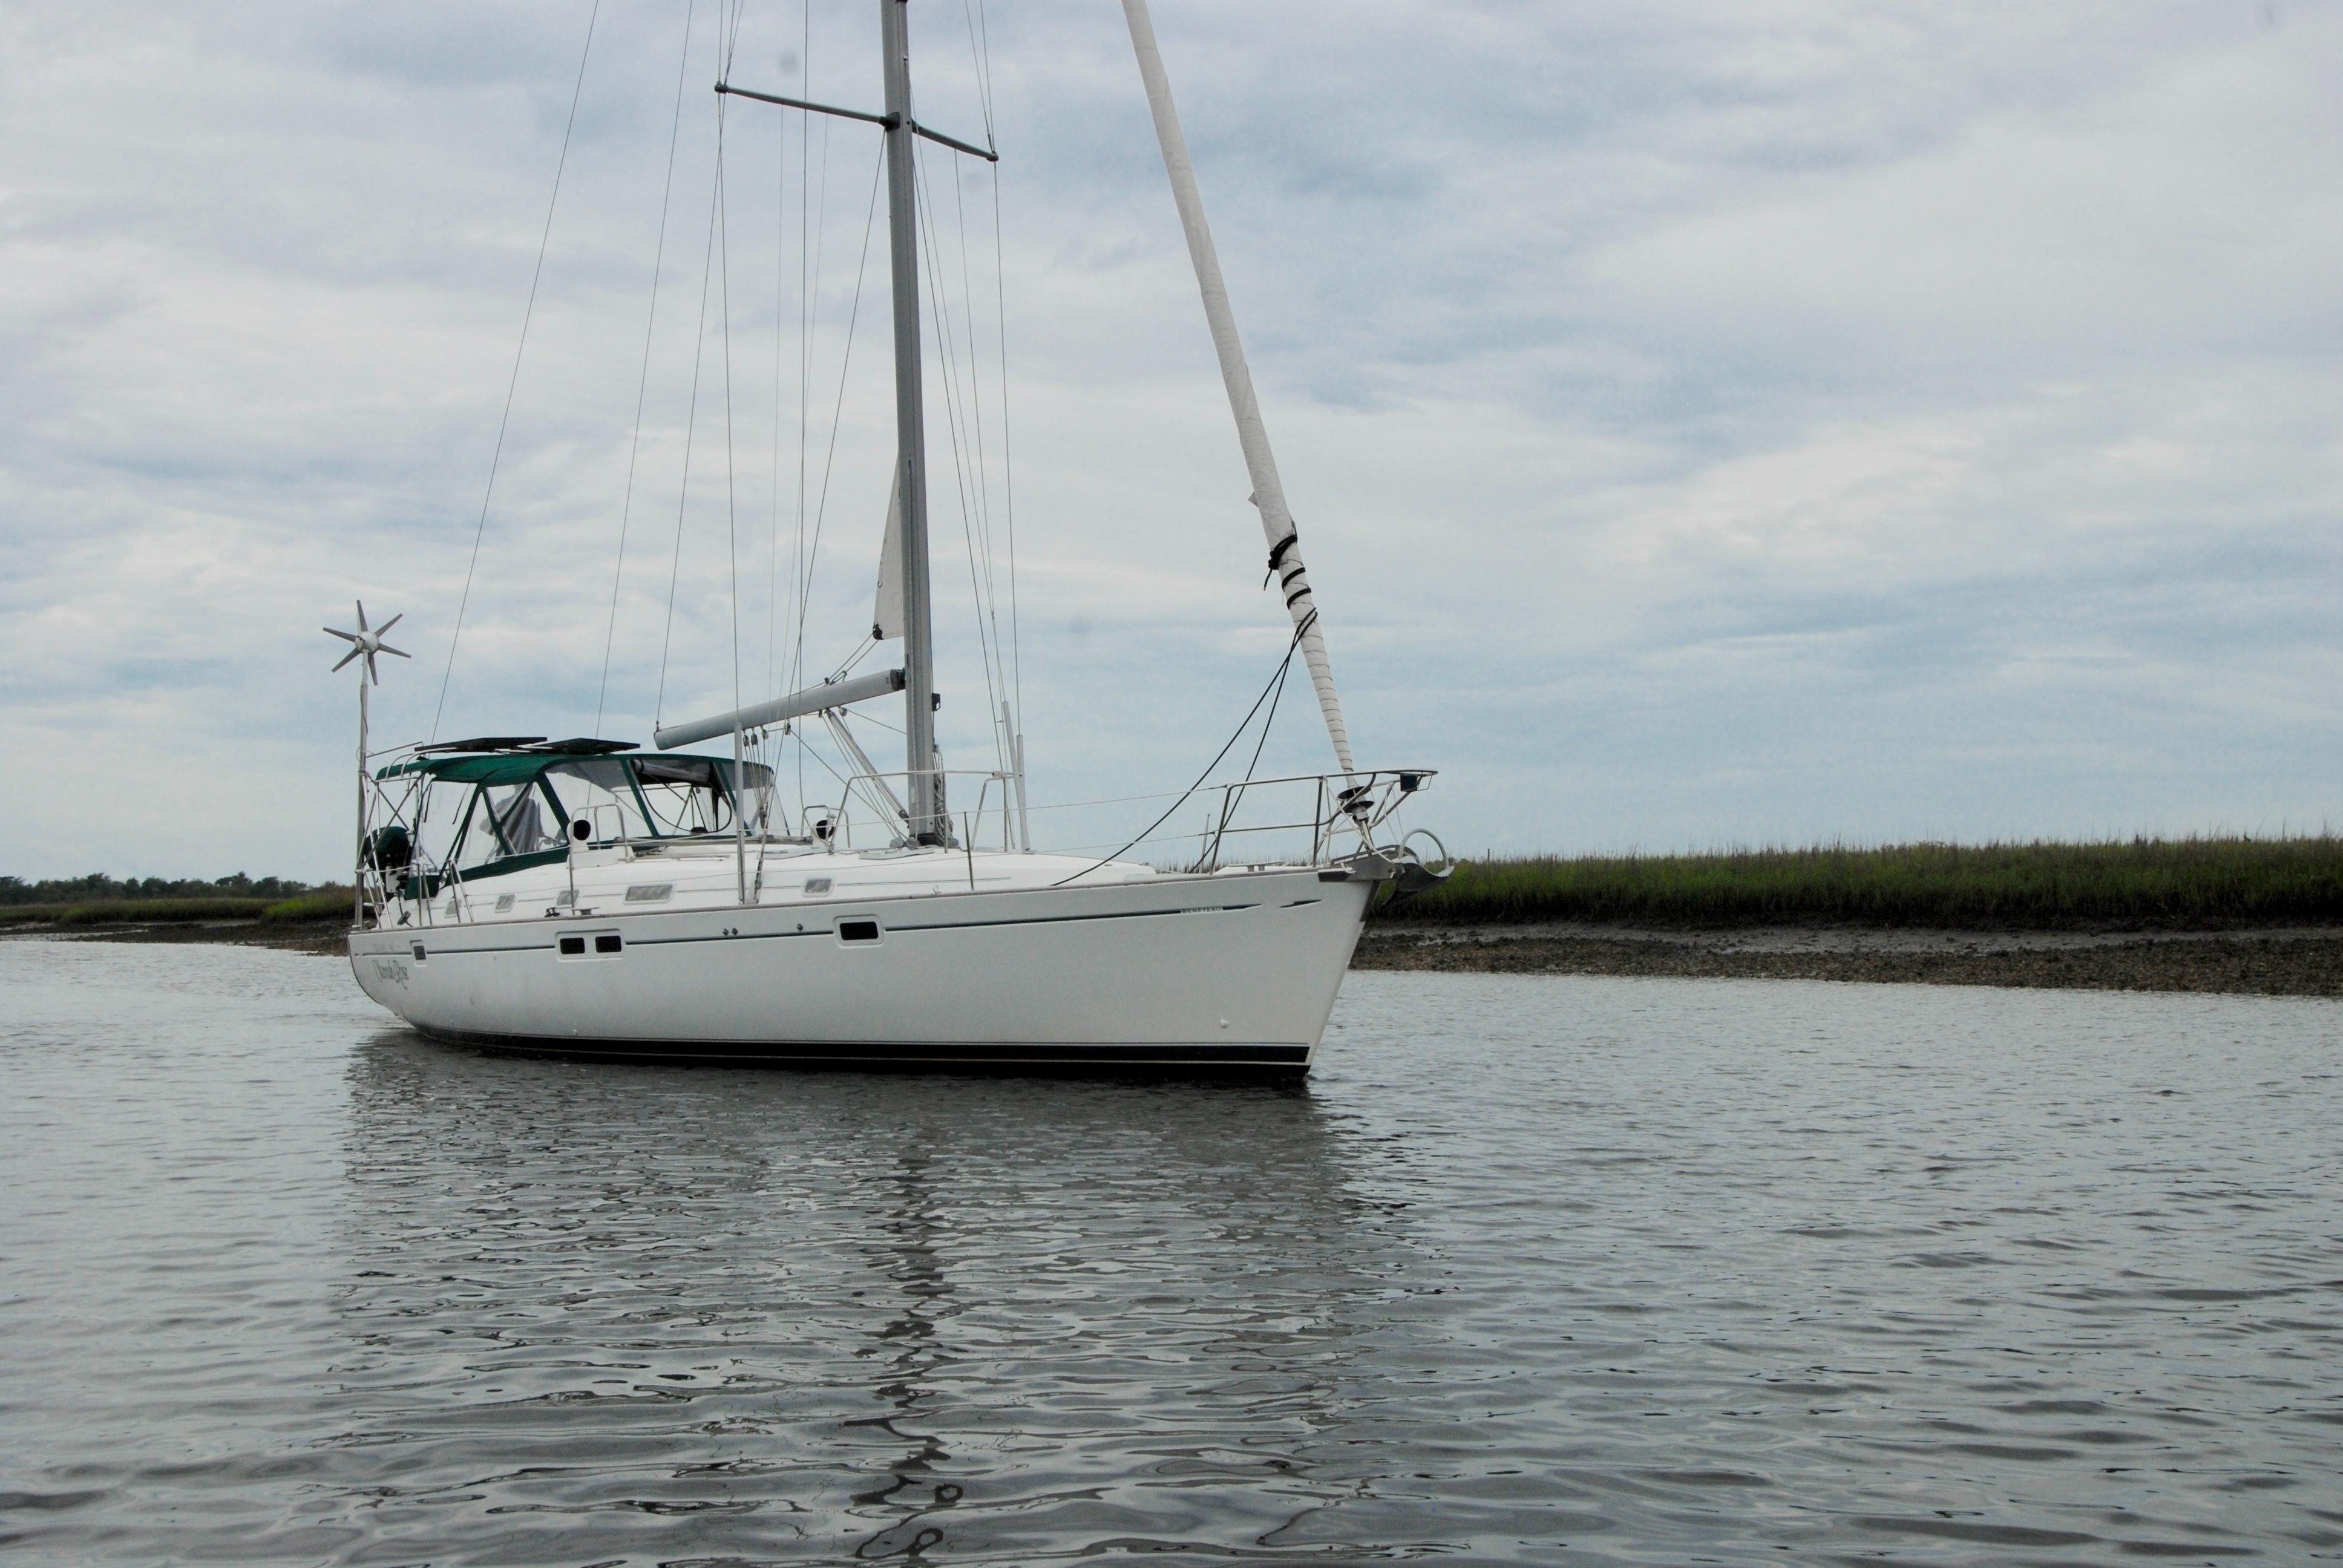 2000 beneteau 461 sail boat for sale www yachtworld com rh yachtworld com Beneteau Sailboats Review 40 Beneteau Sailboats